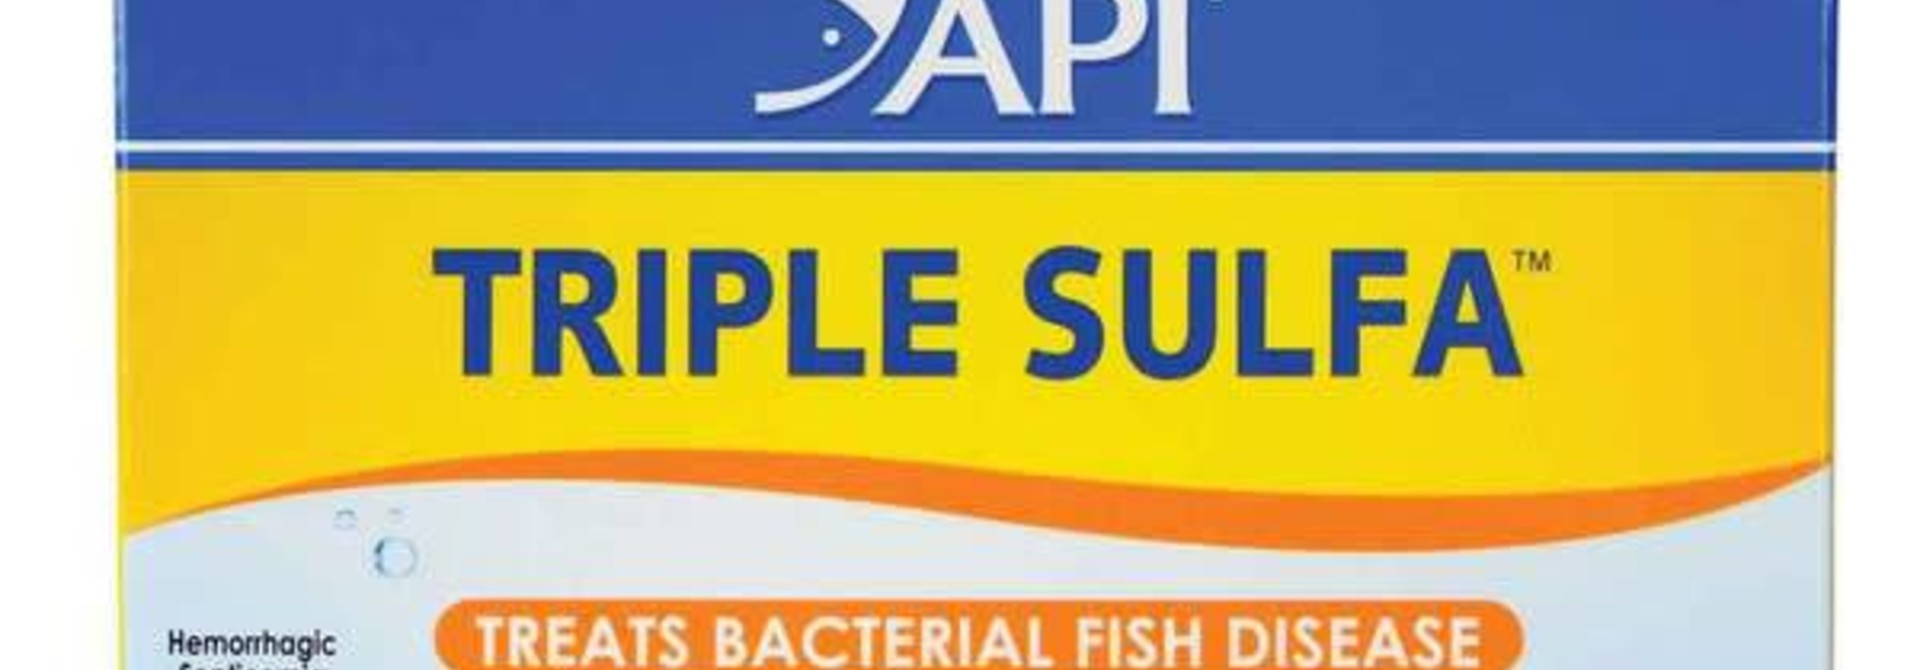 50P Triple Sulfa Powder Packets